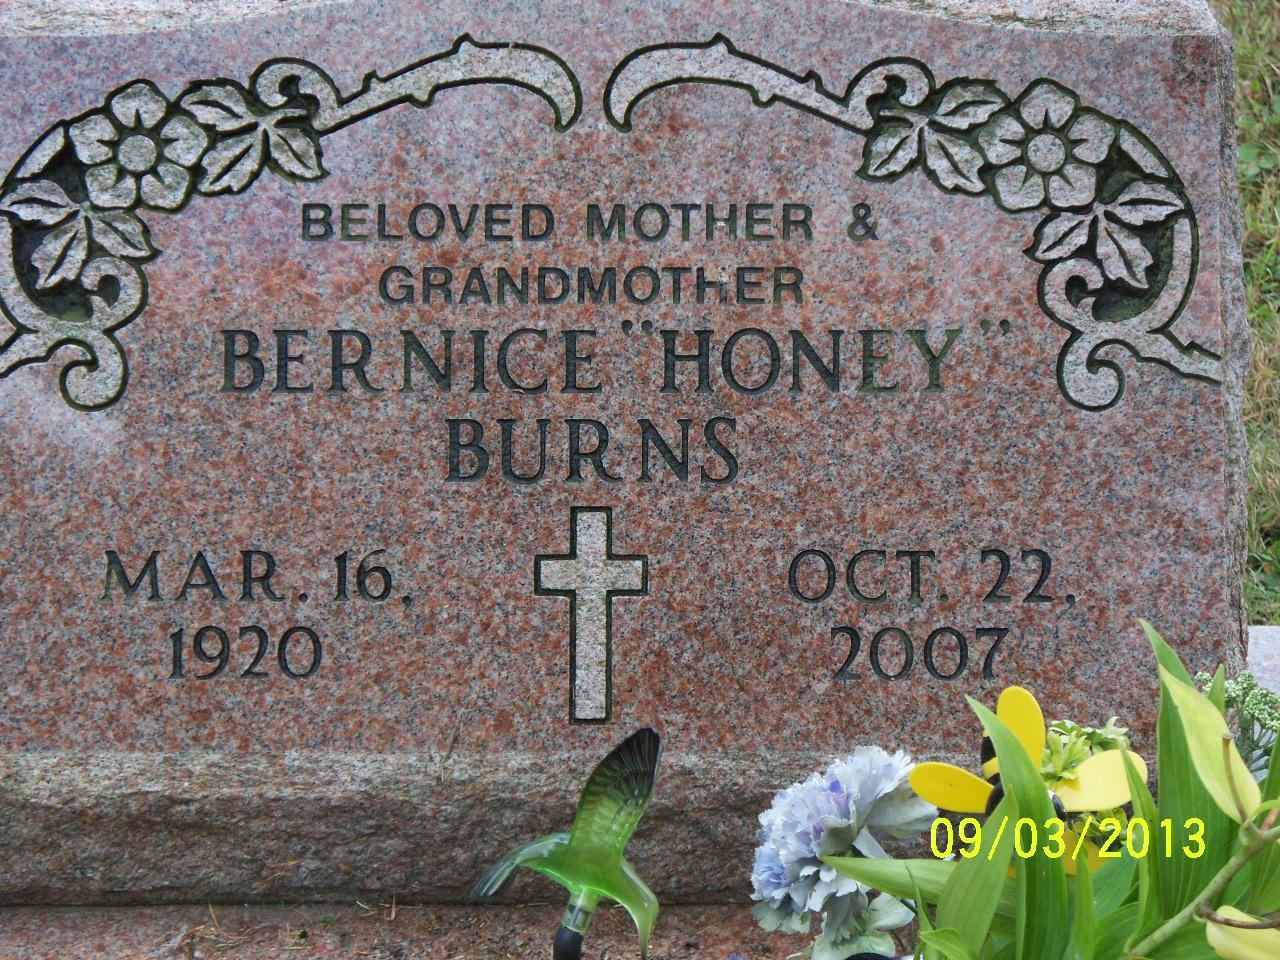 Bernice Honey Burns